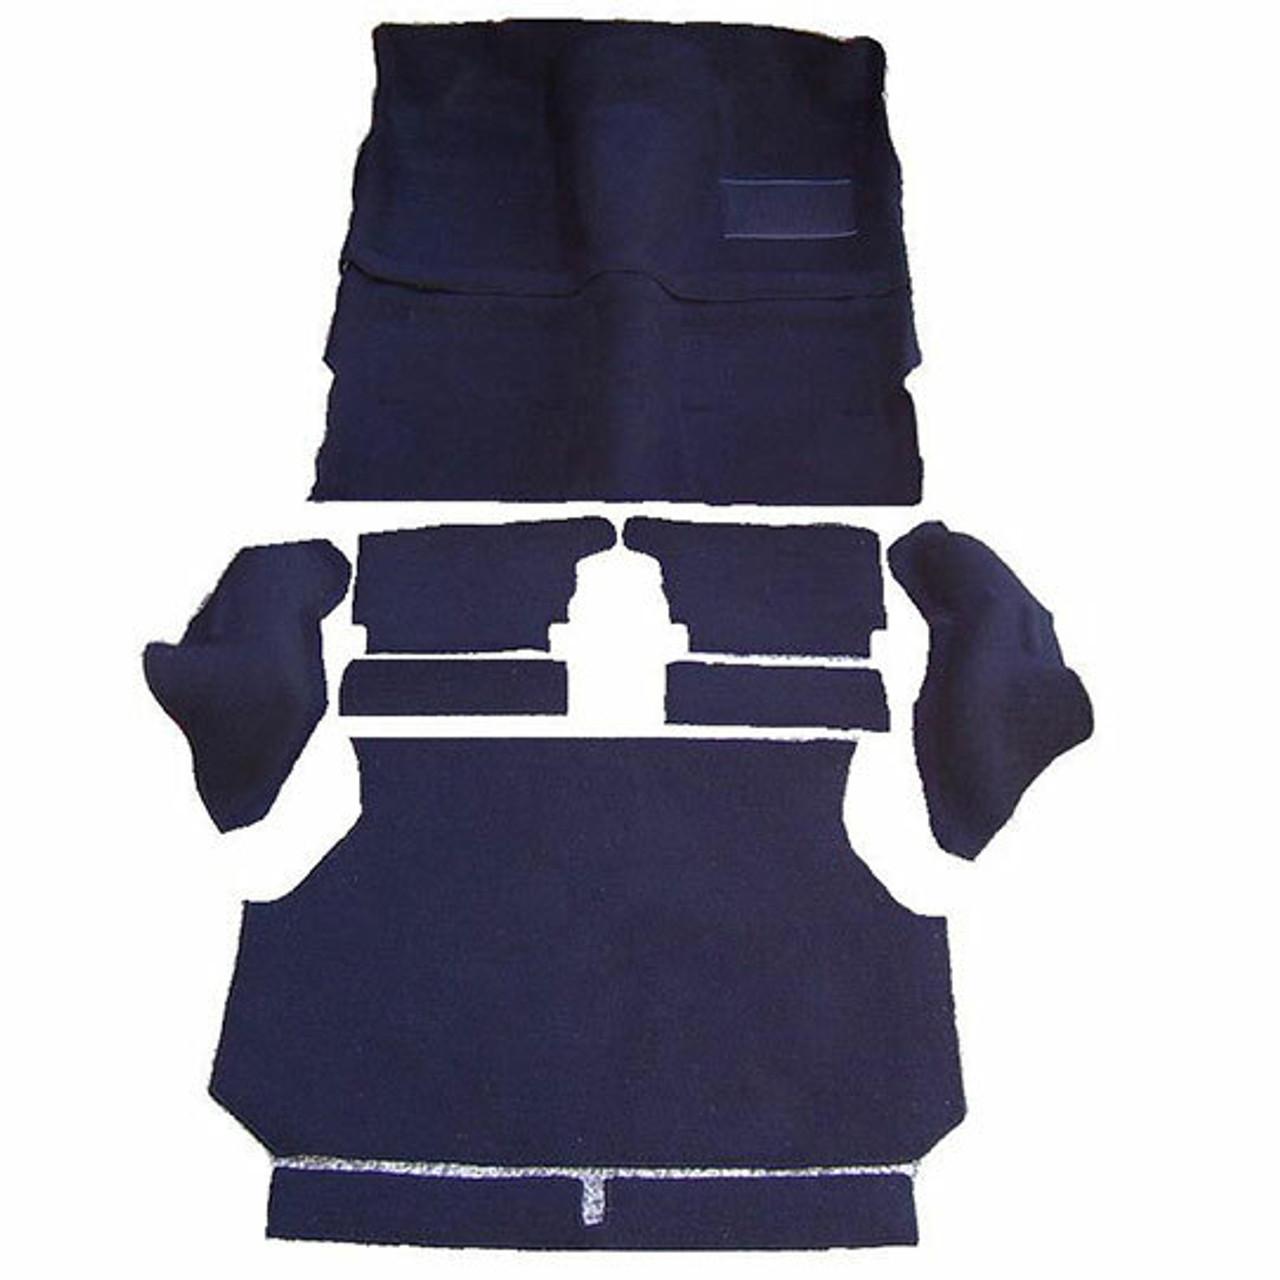 Lx Torana 2 Door Carpet Kit